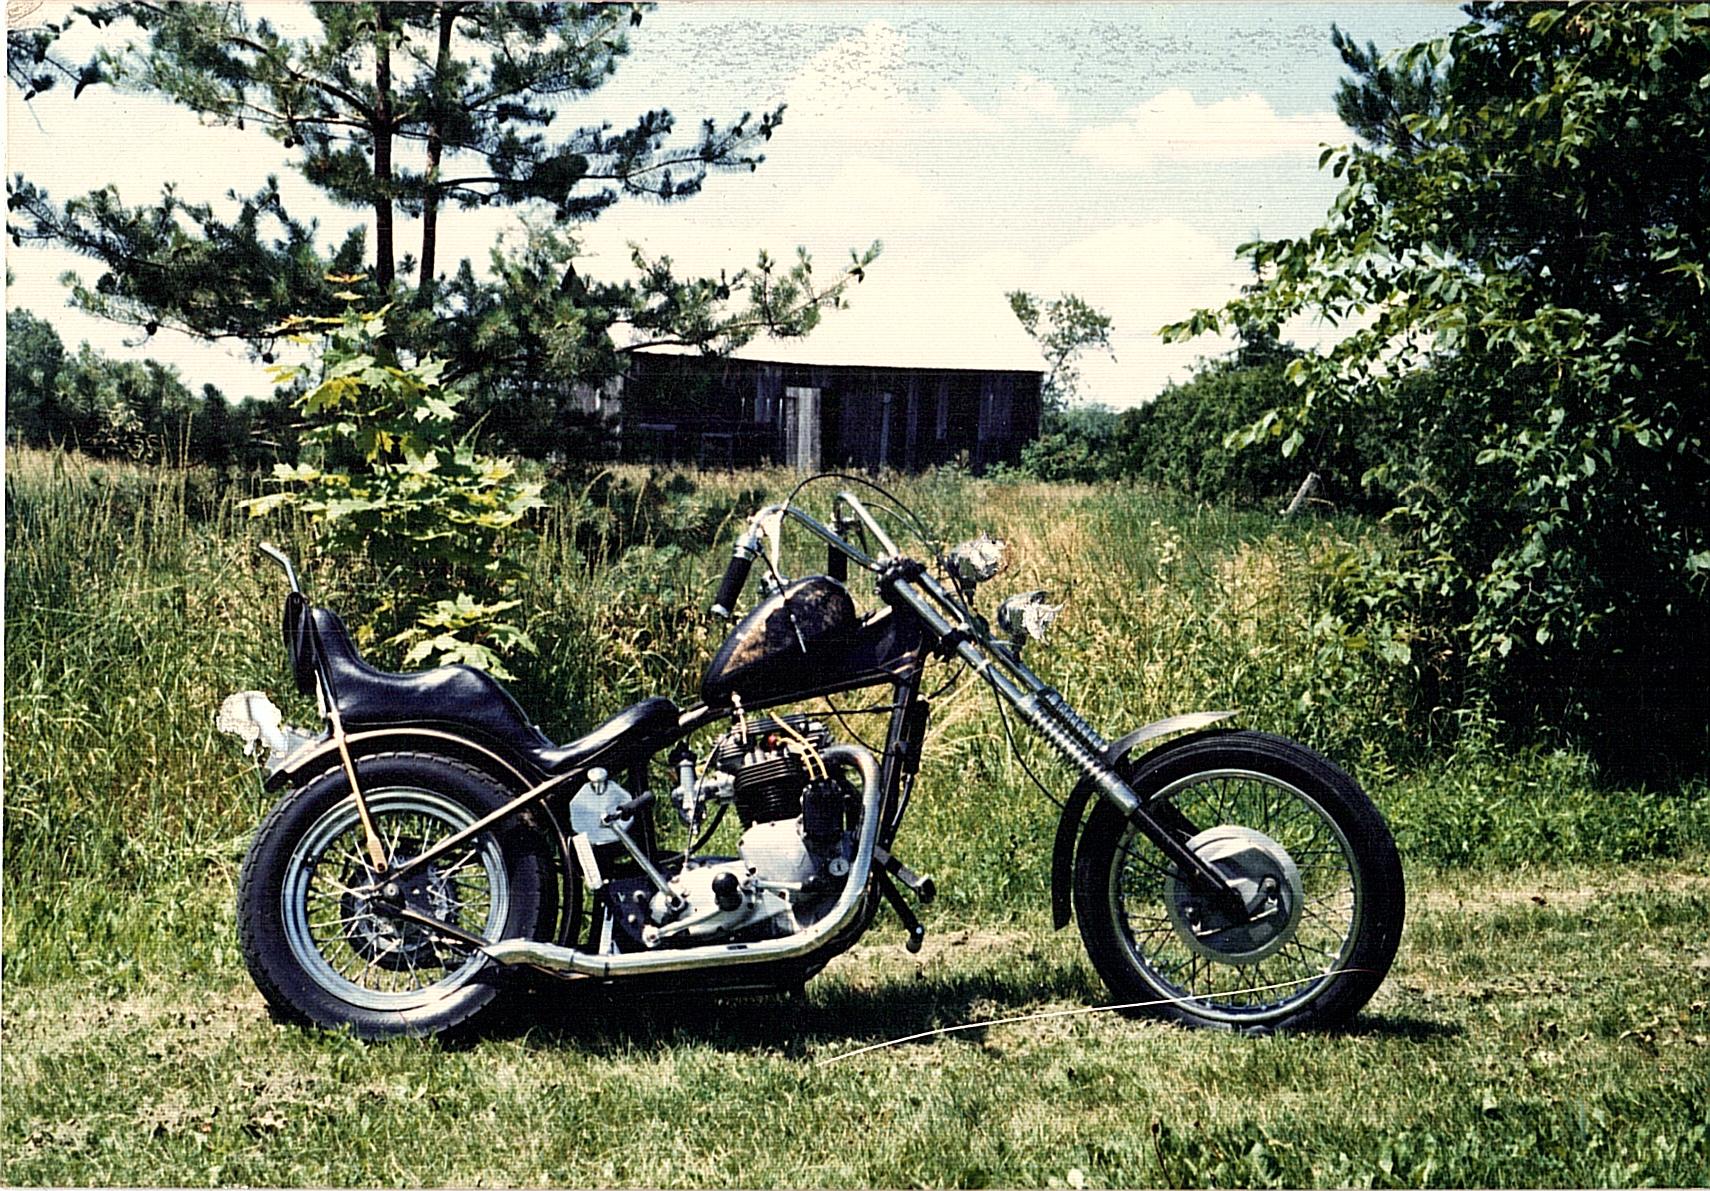 1968 Triumph 750 Chopper motorcycle